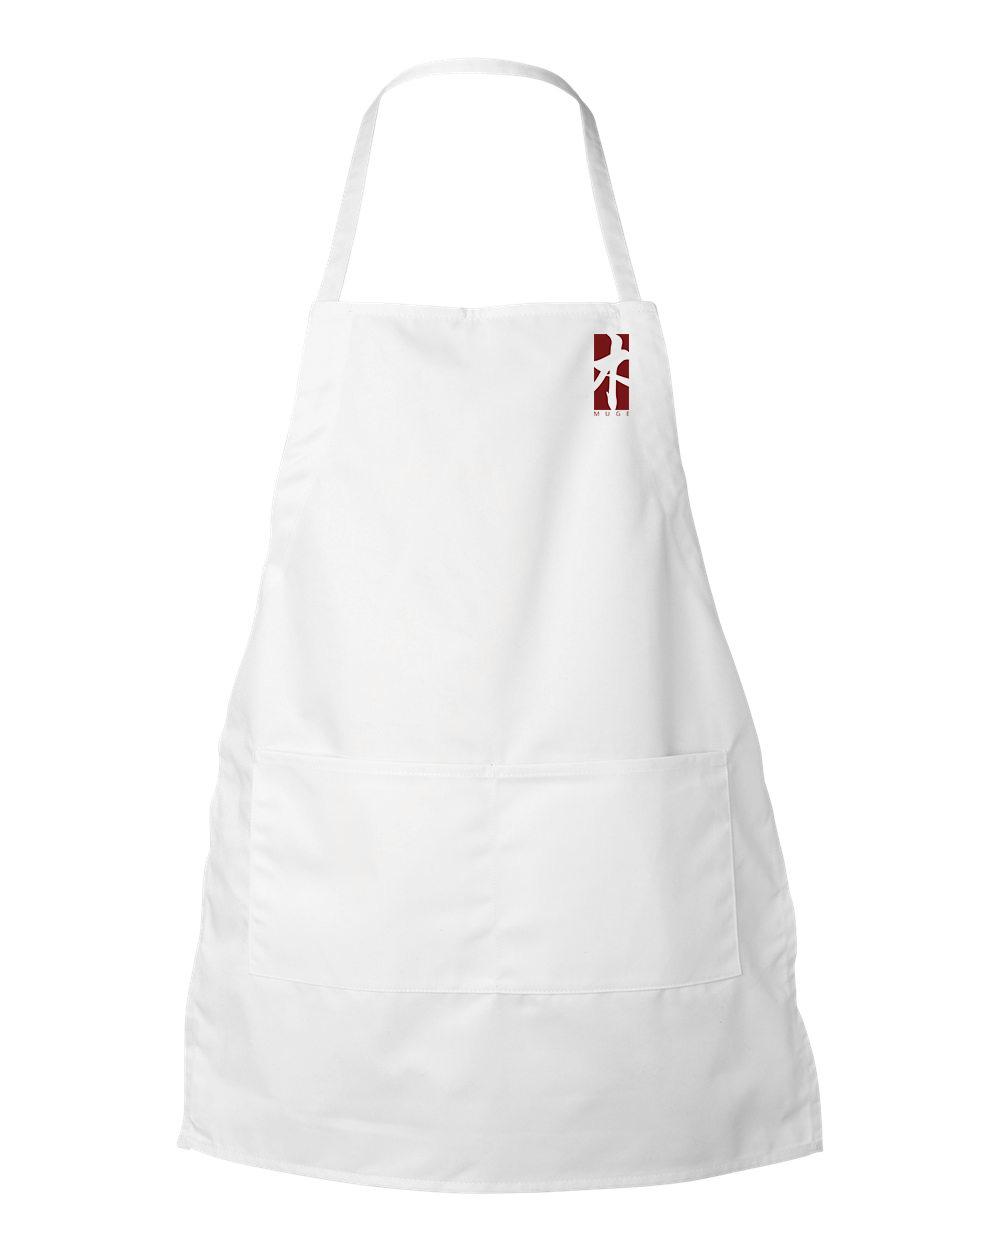 White apron mockup - Prev Next